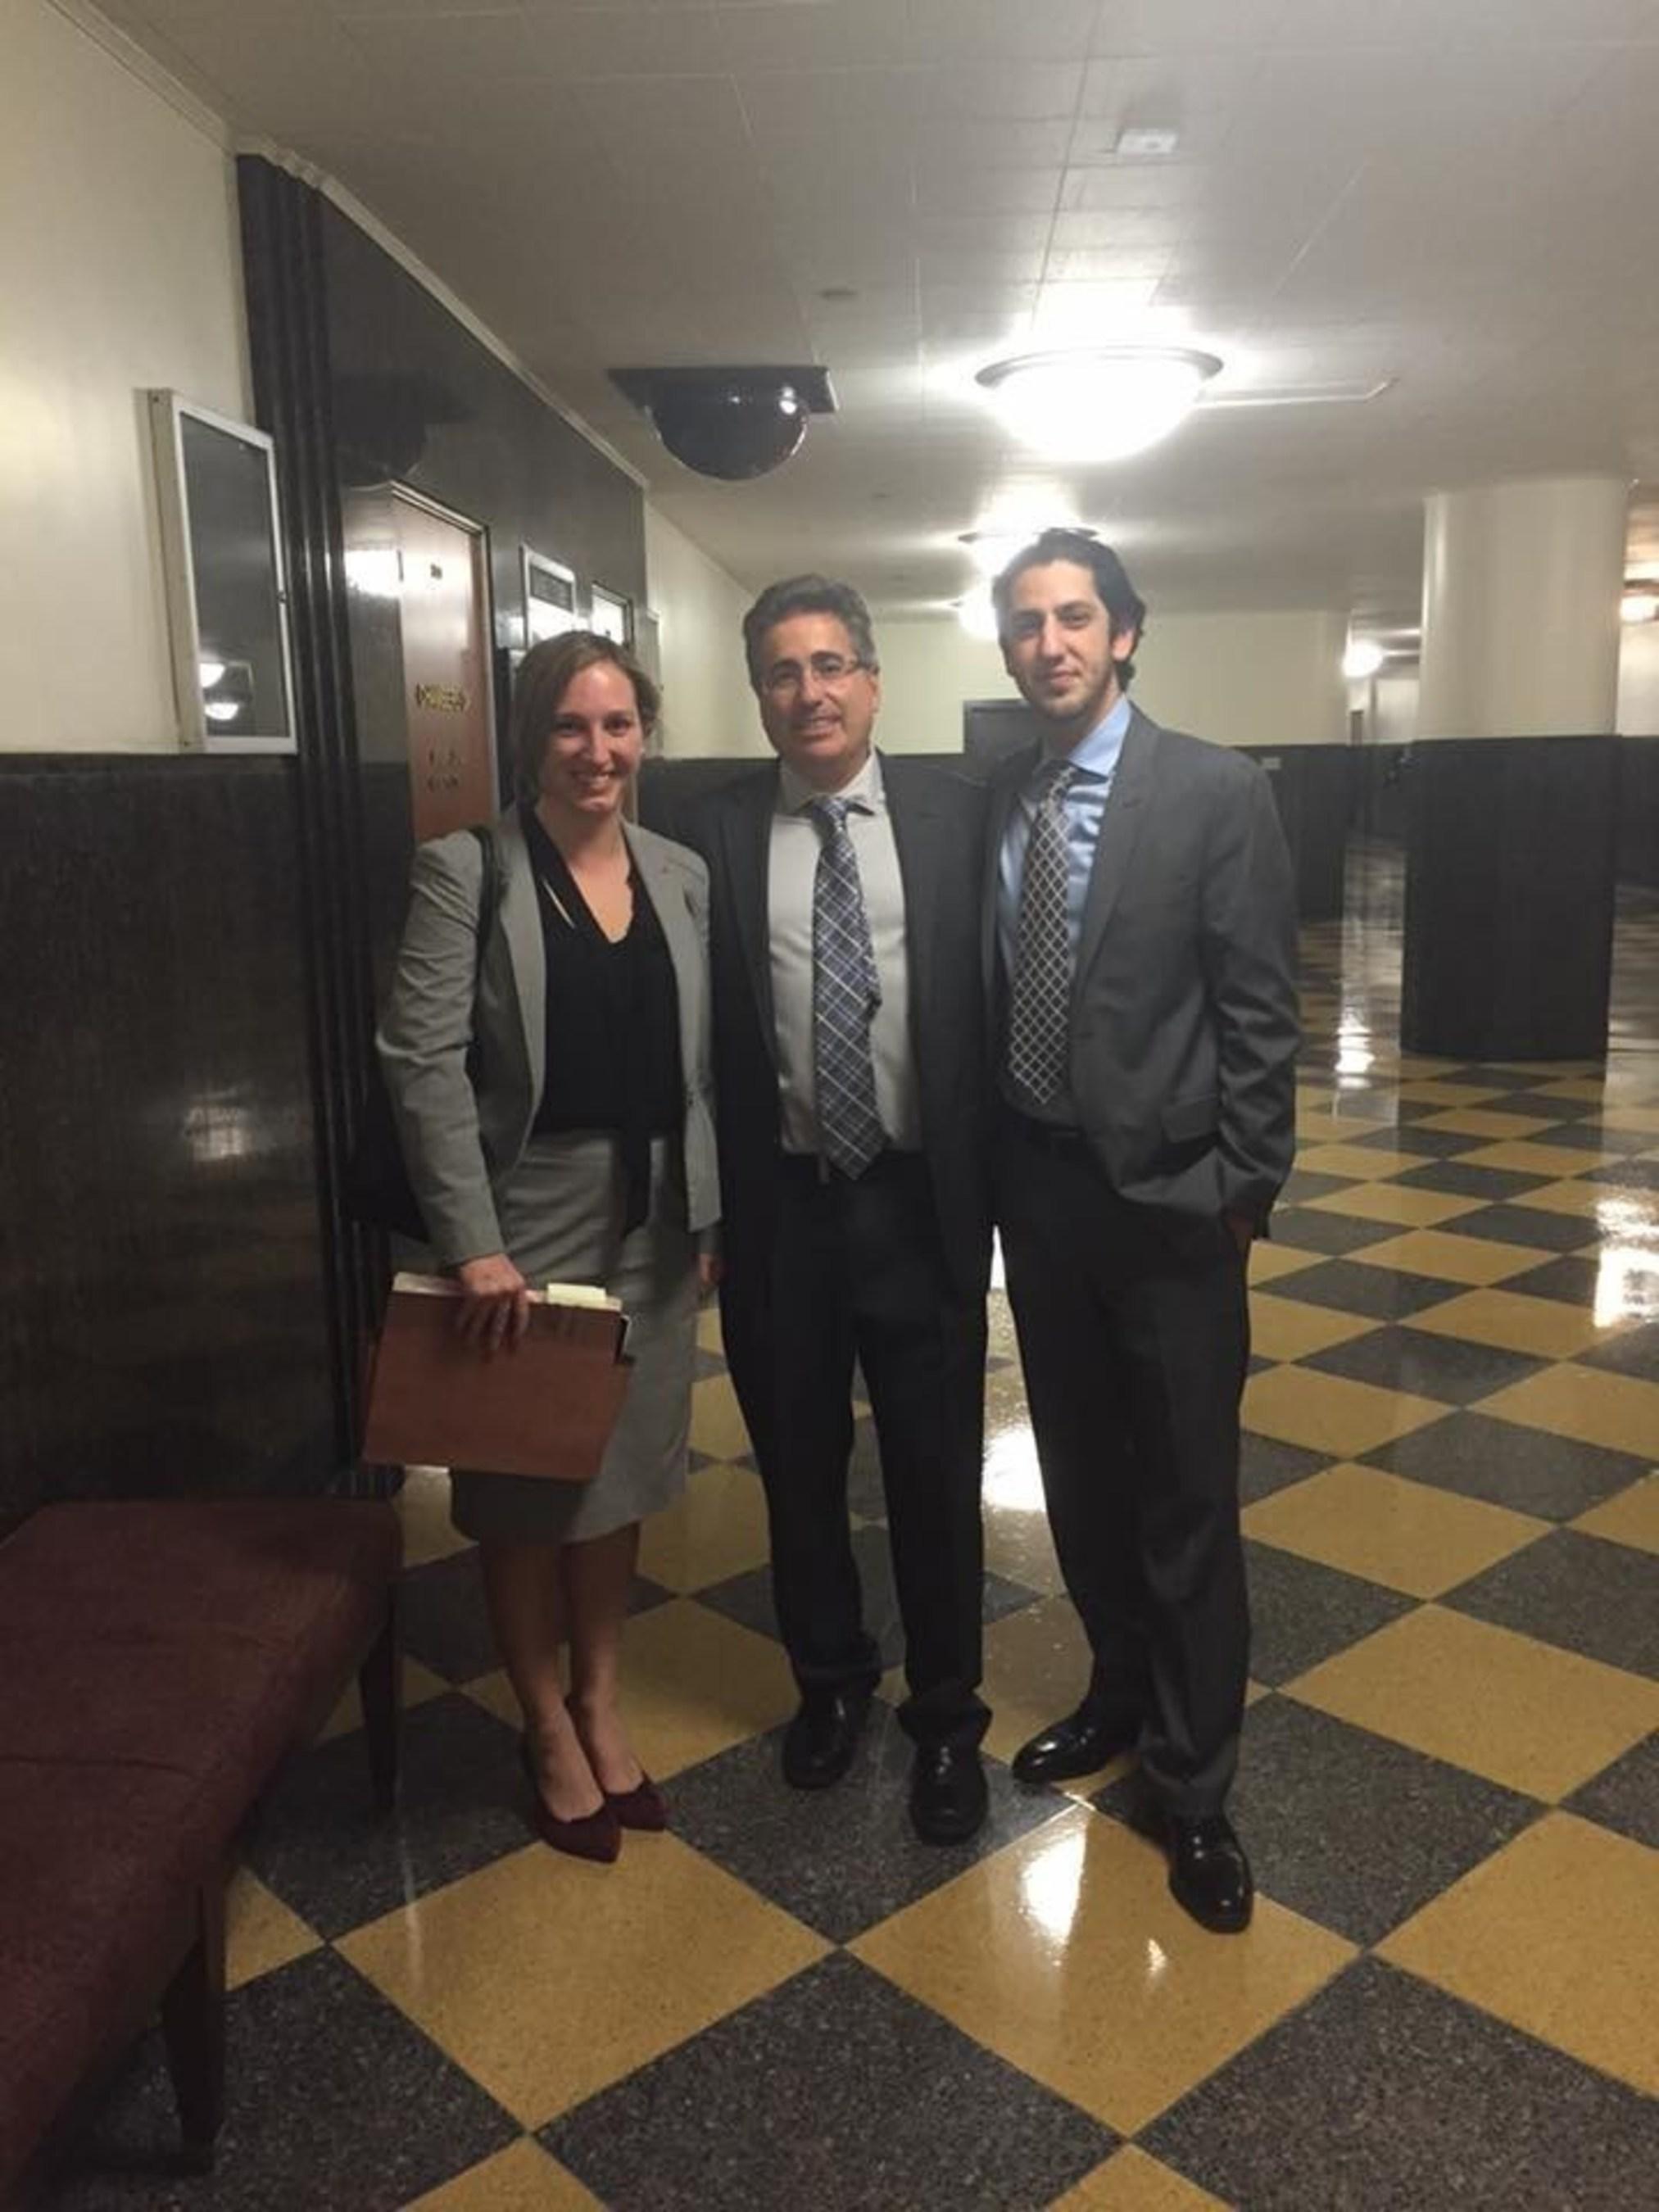 Attorneys for Yowan Yang: Jim DeSimone, Kaveh Navab, and Ryann Hall